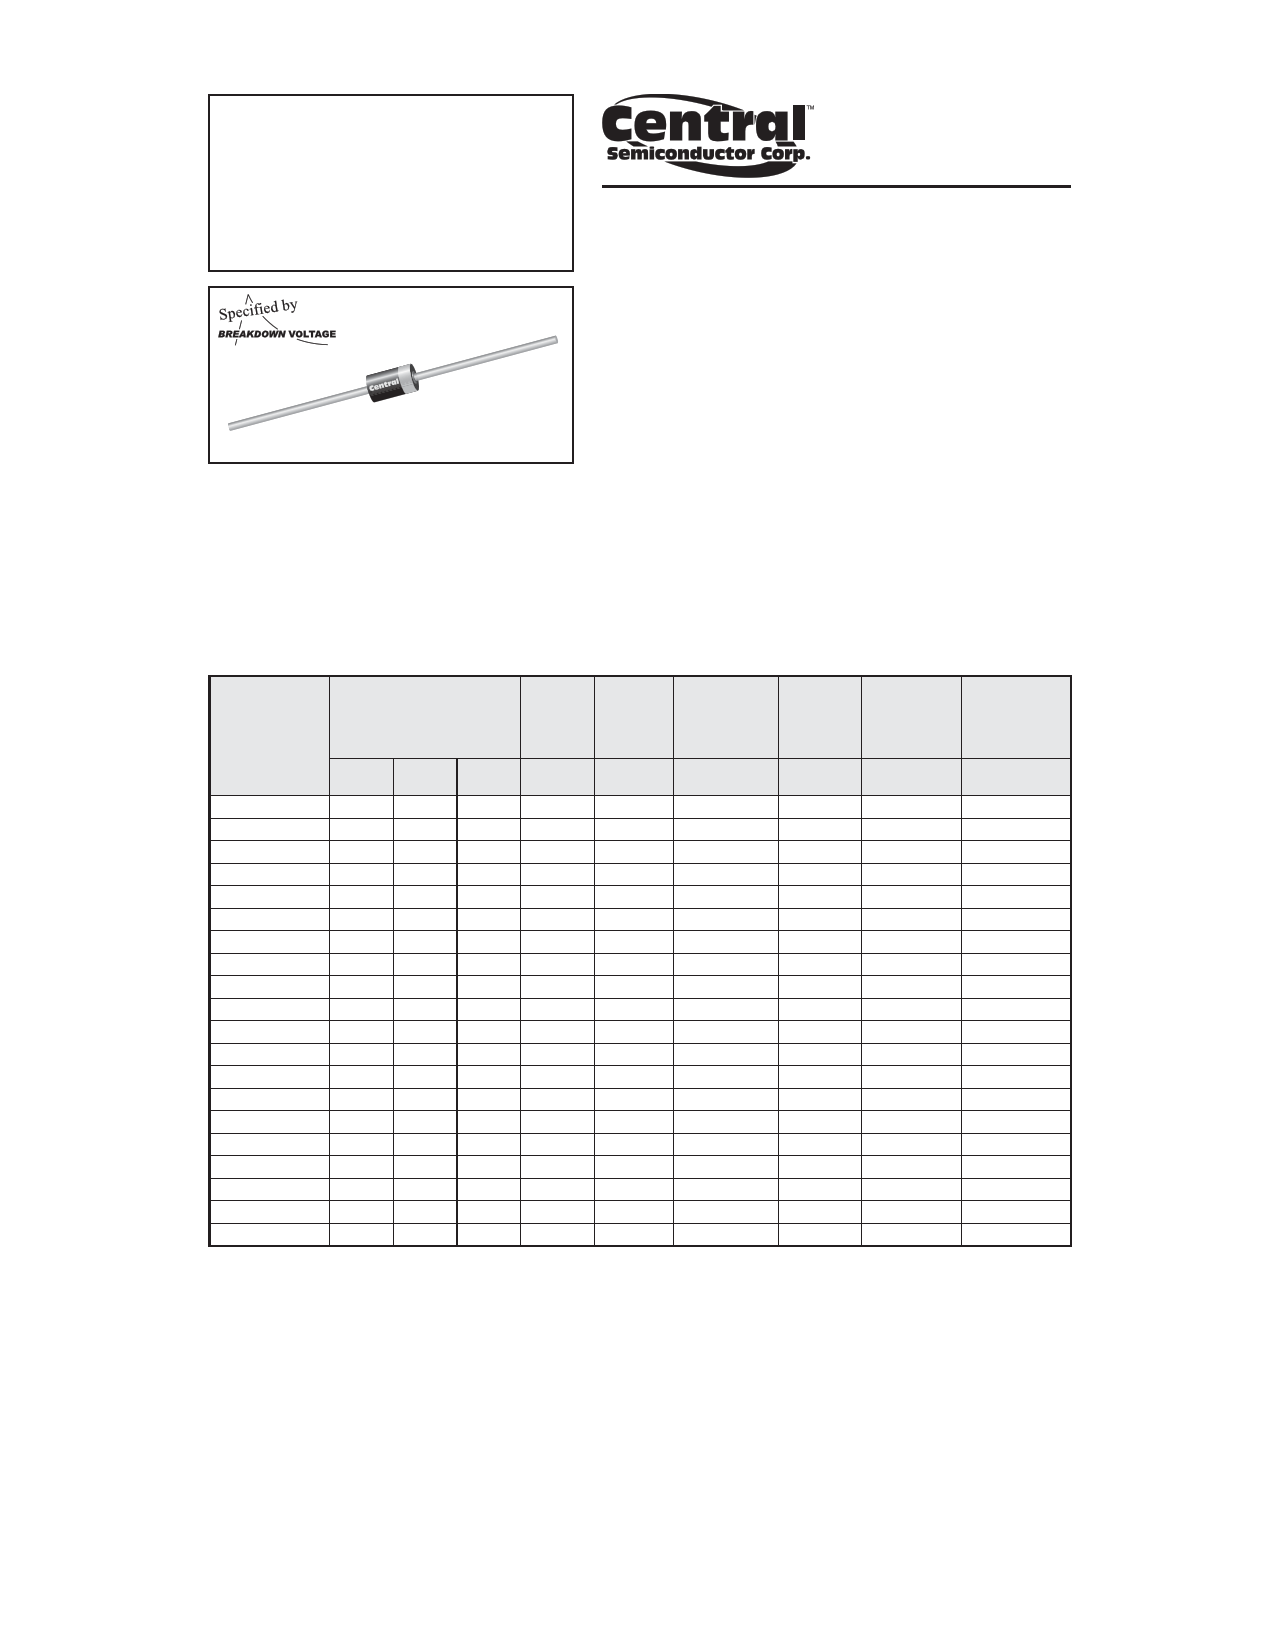 1.5CE10A datasheet